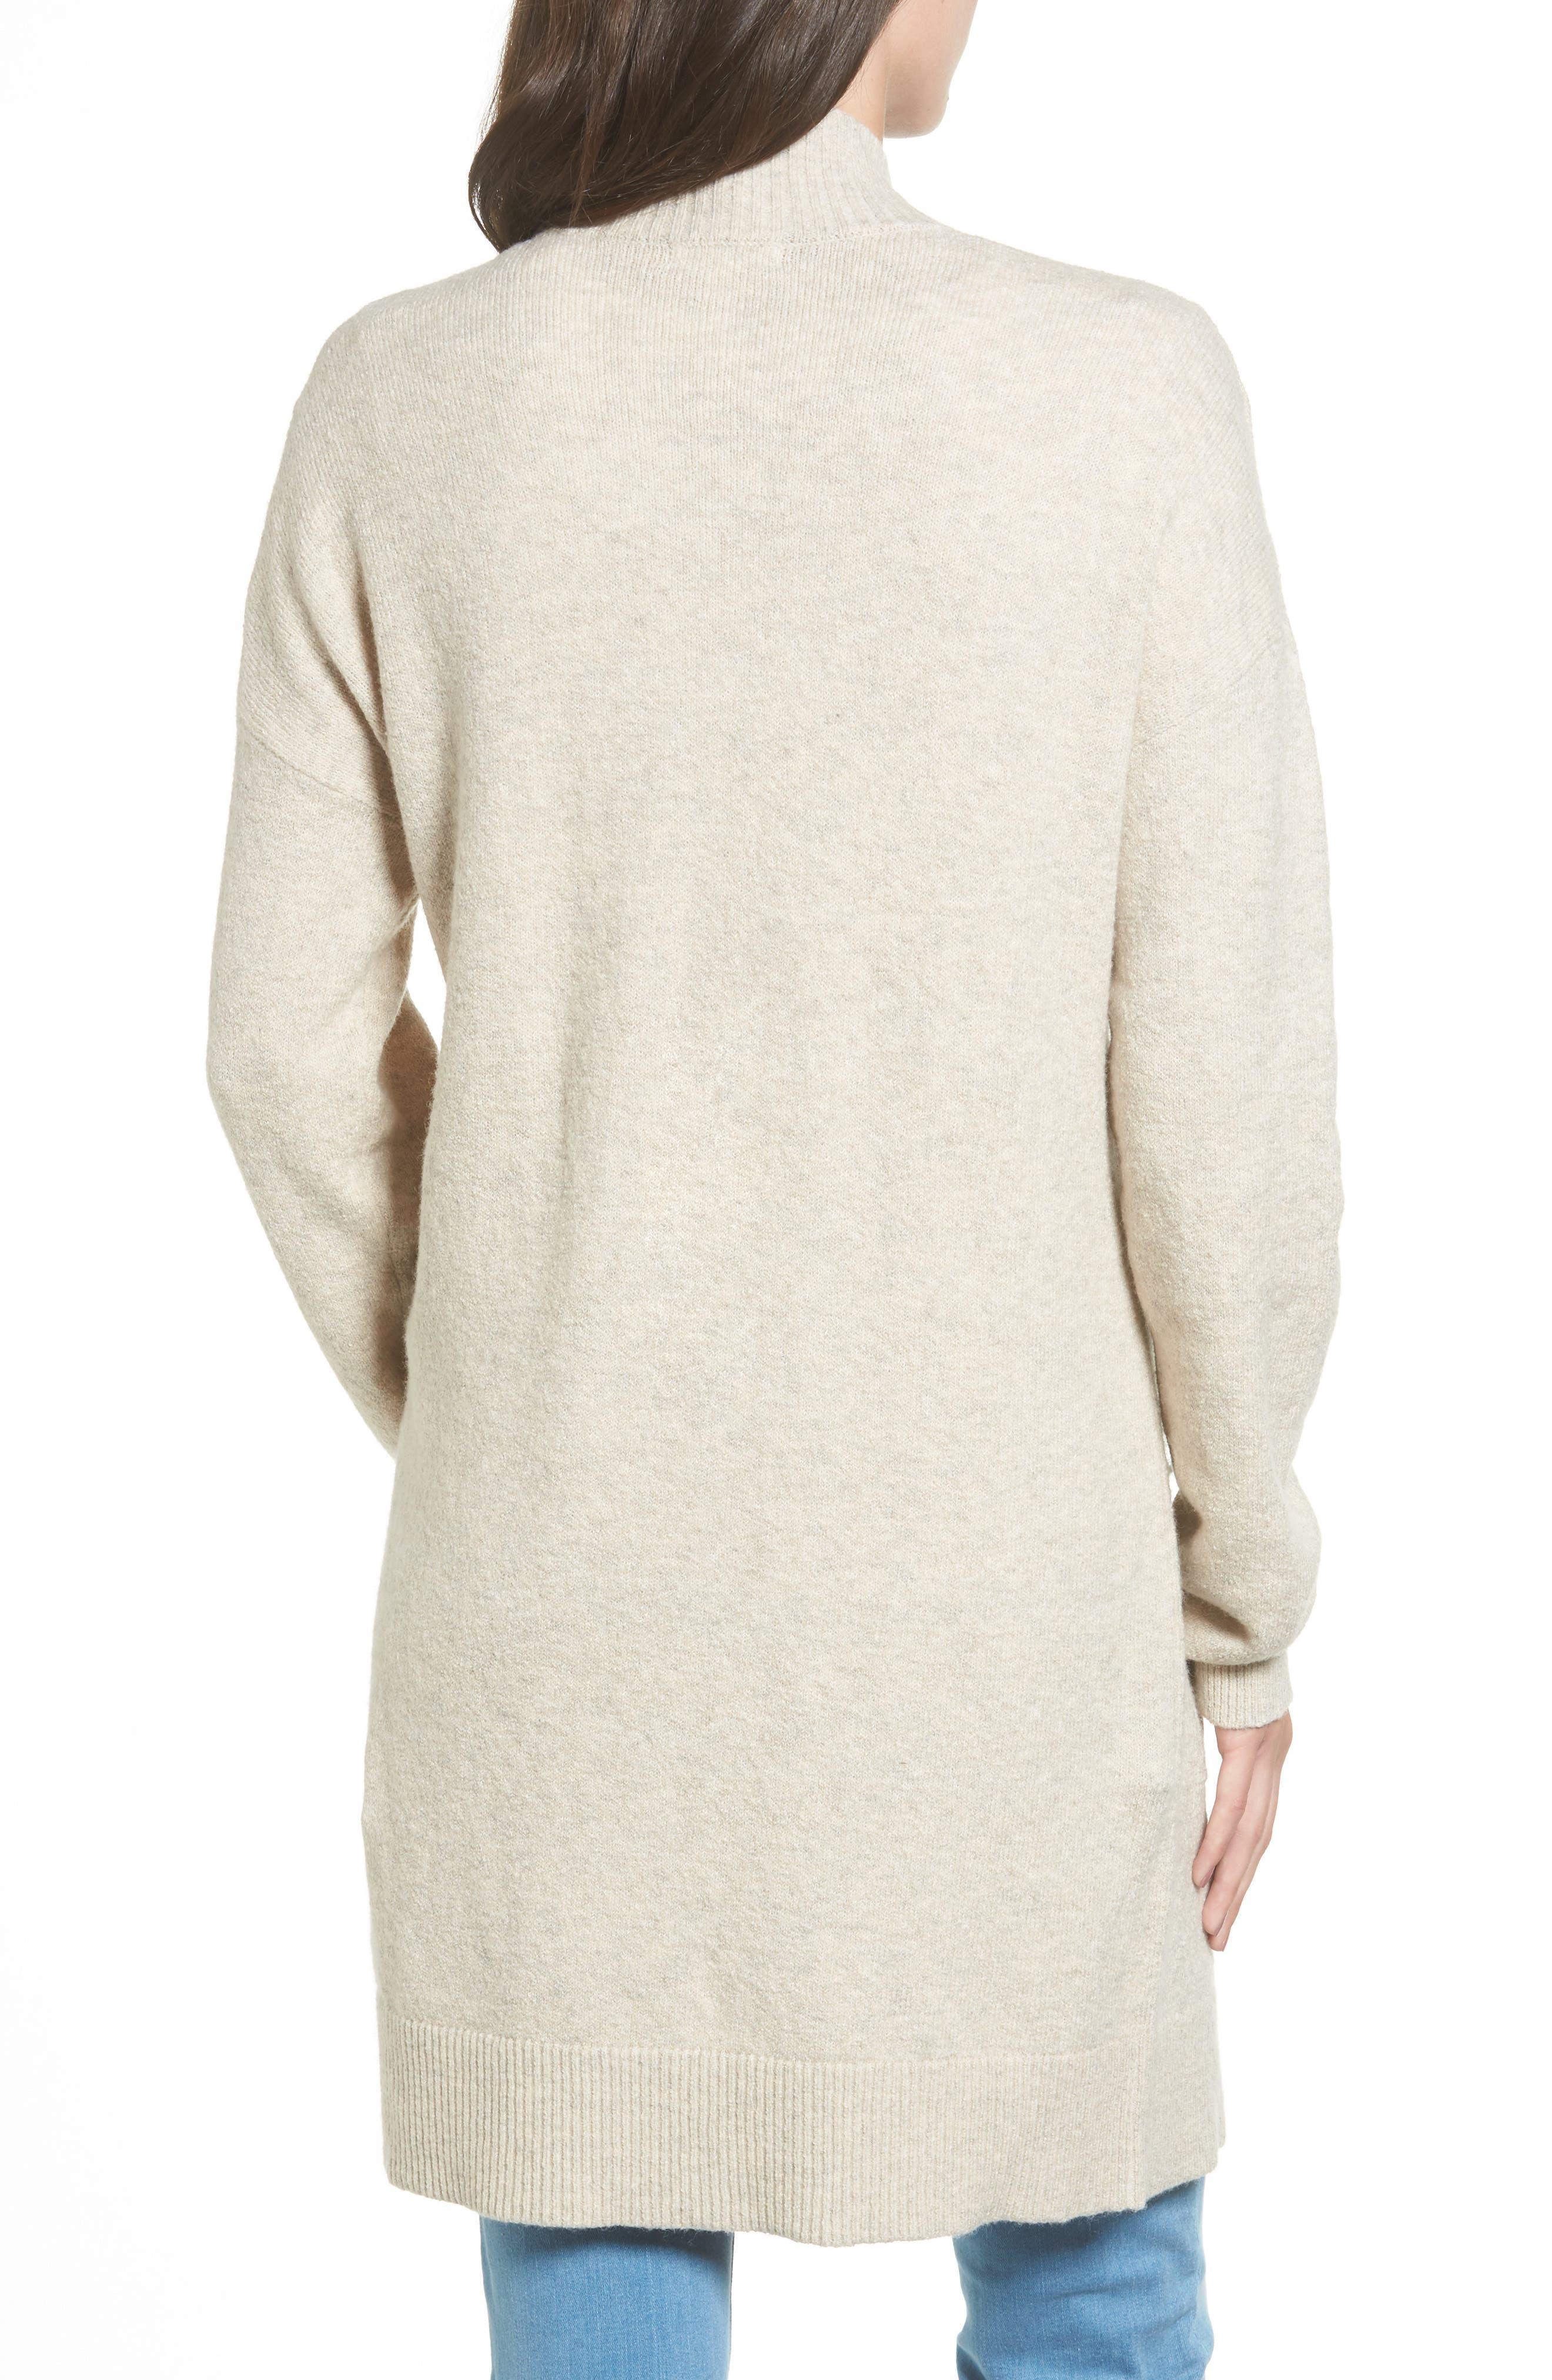 Women's Cardigan Sweaters | Nordstrom